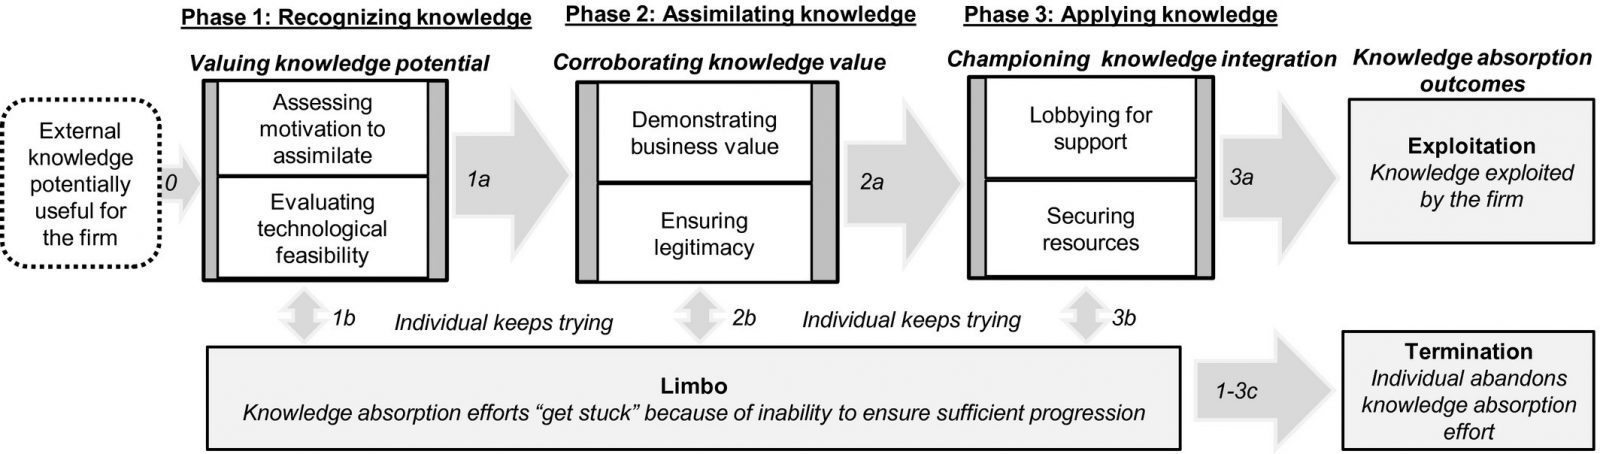 Absorbtive capacity Figure 2